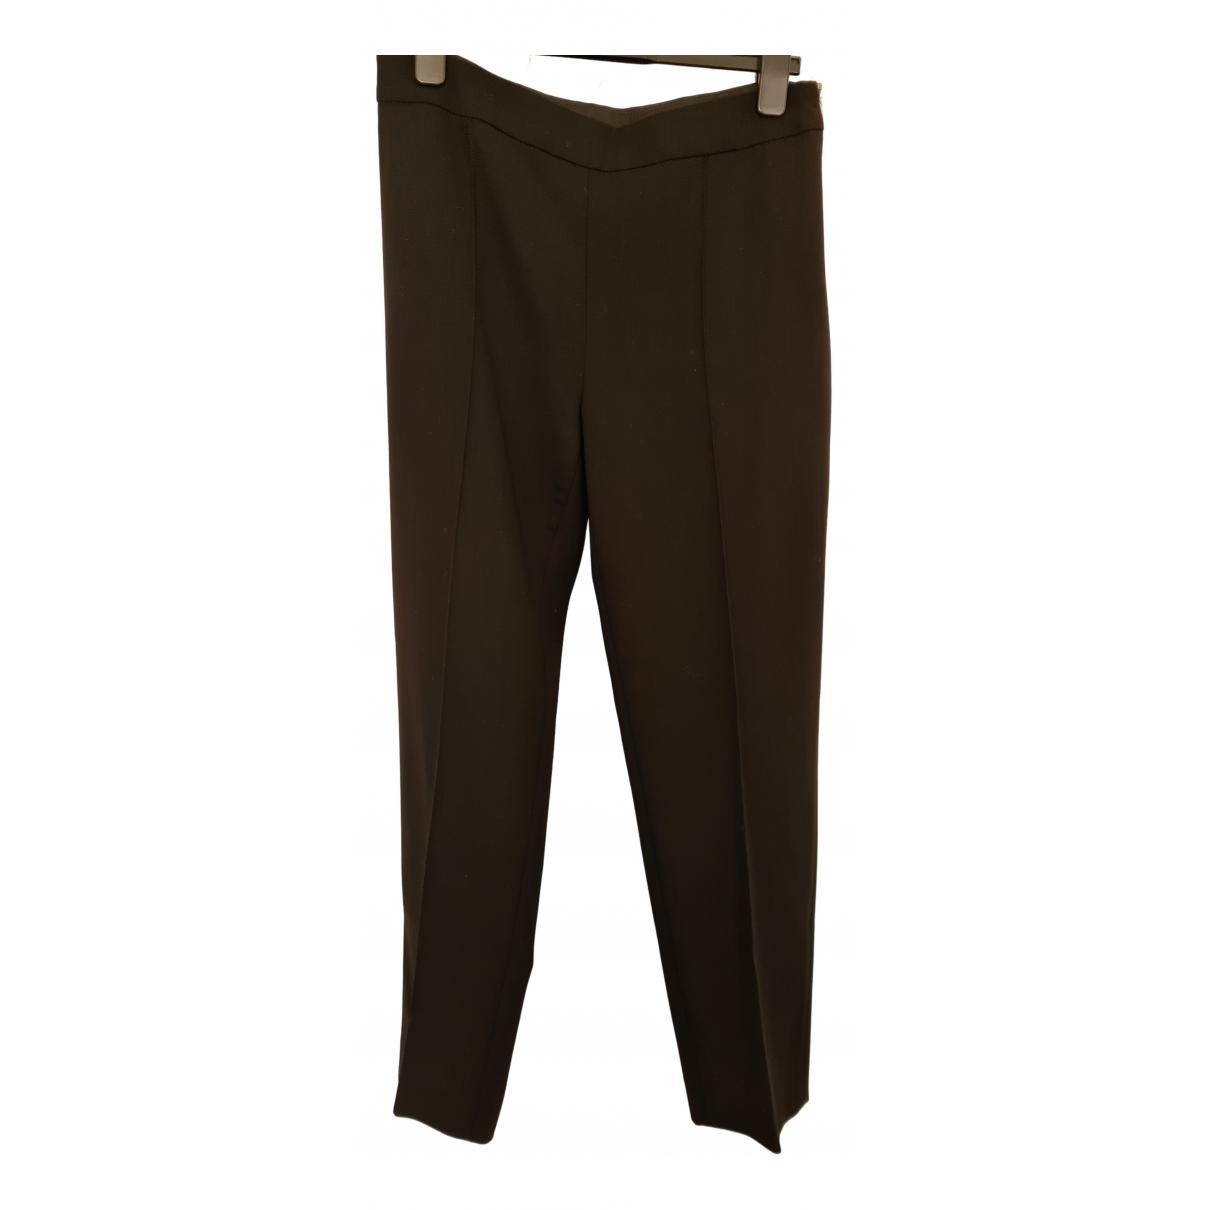 Max Mara N Black Wool Trousers for Women 42 FR